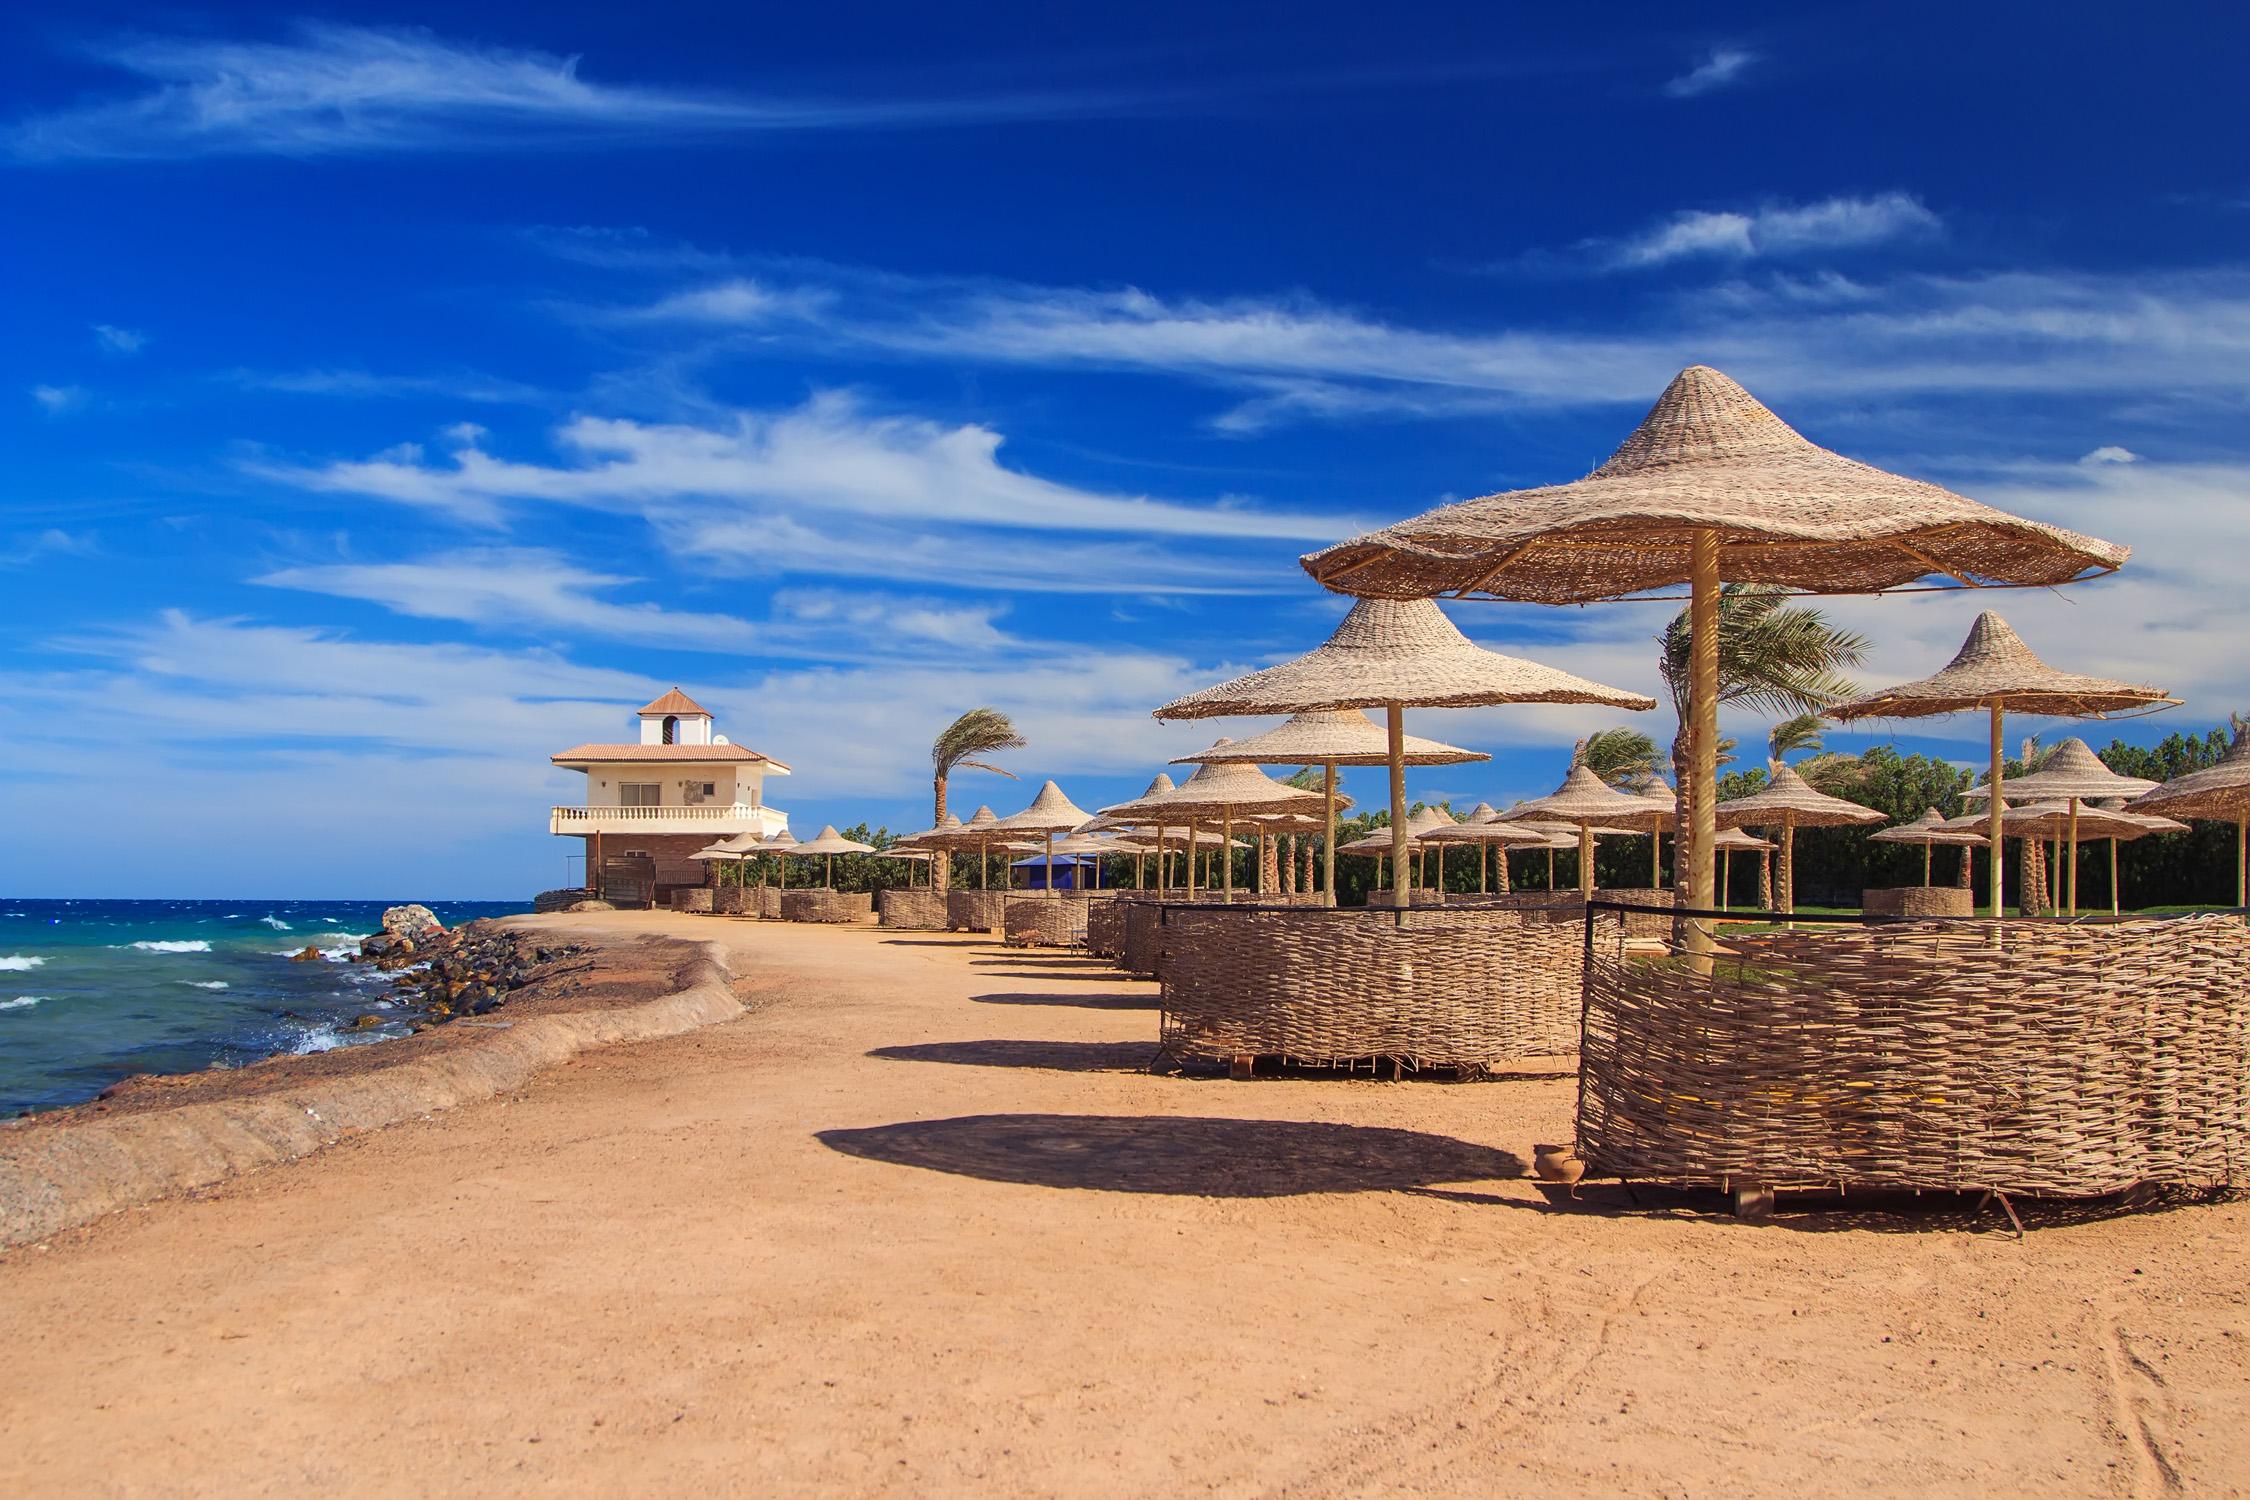 Grand Seas Hotel